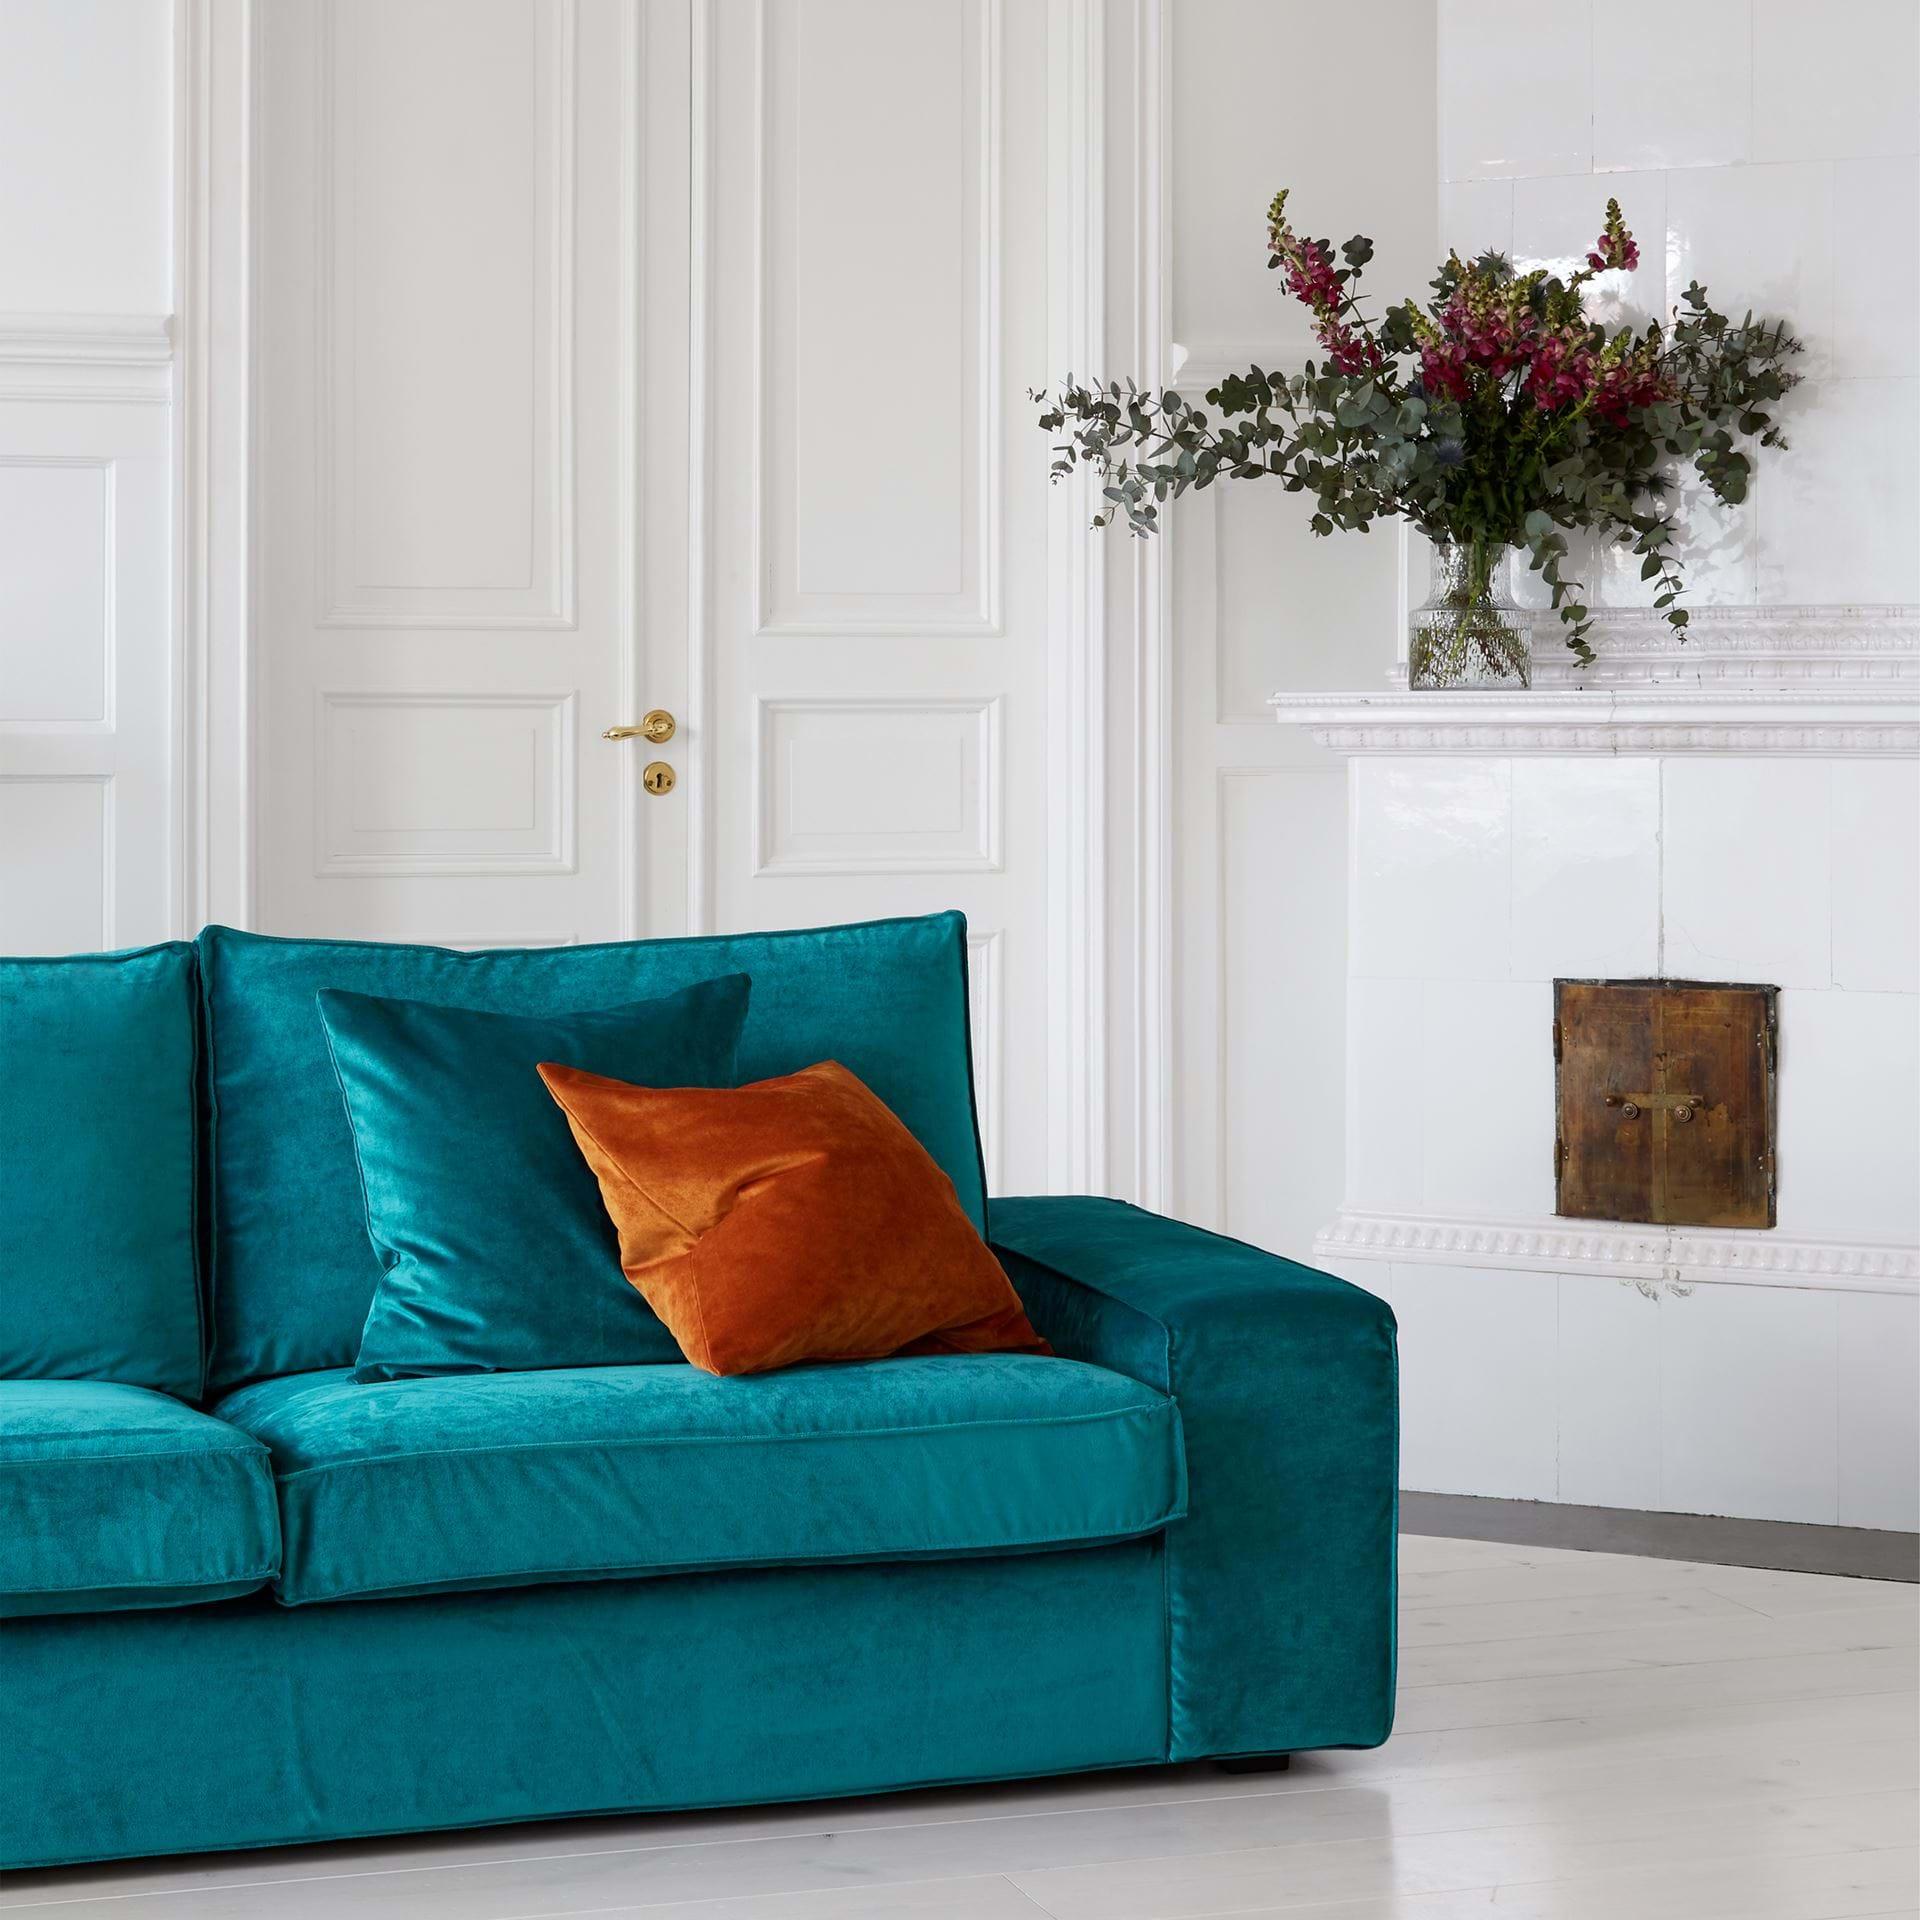 Ikea Kivik 2 Seater Sofa Cover Bemz